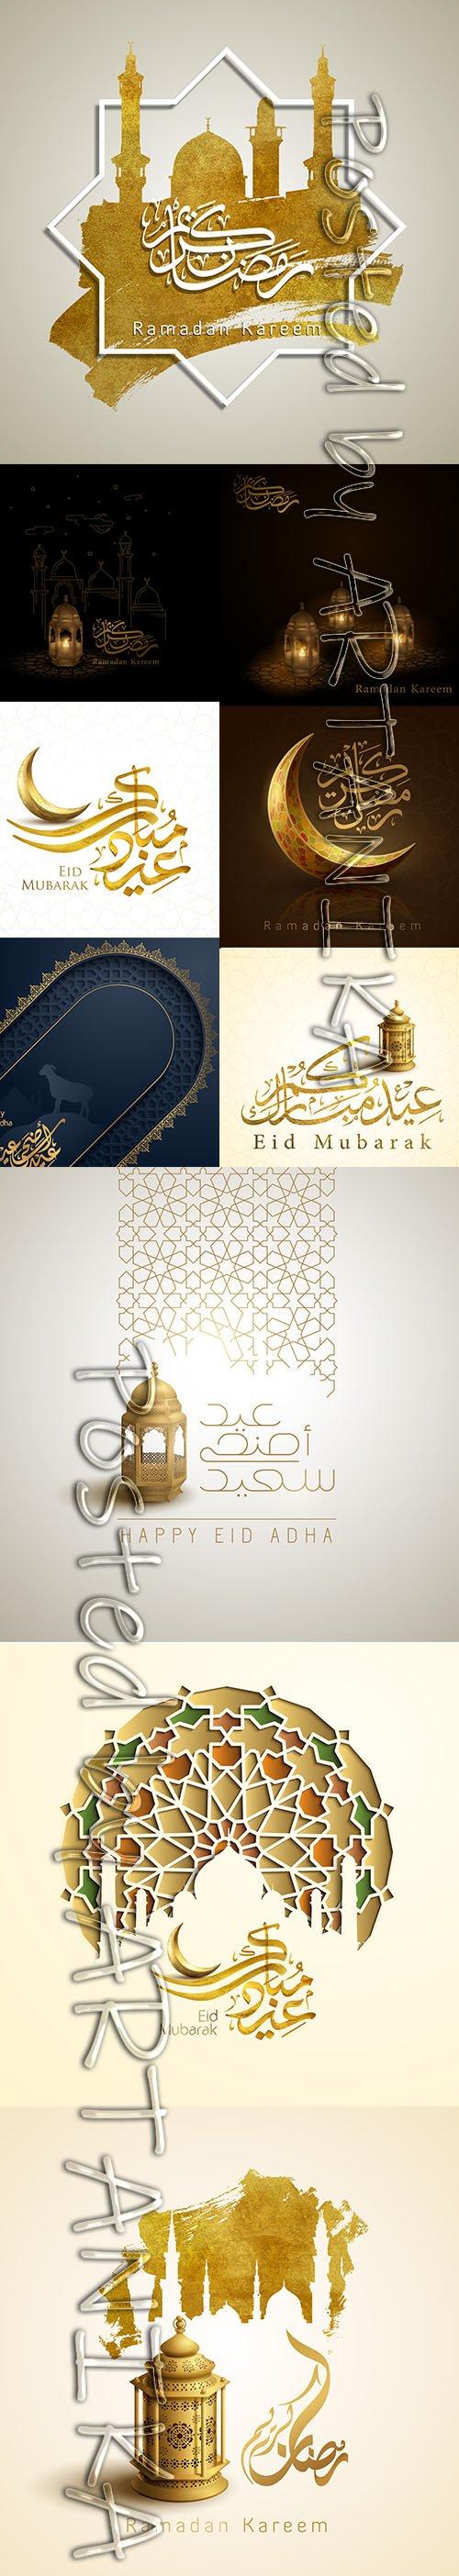 Vector Greeting Card of Arabic Design Illustrations